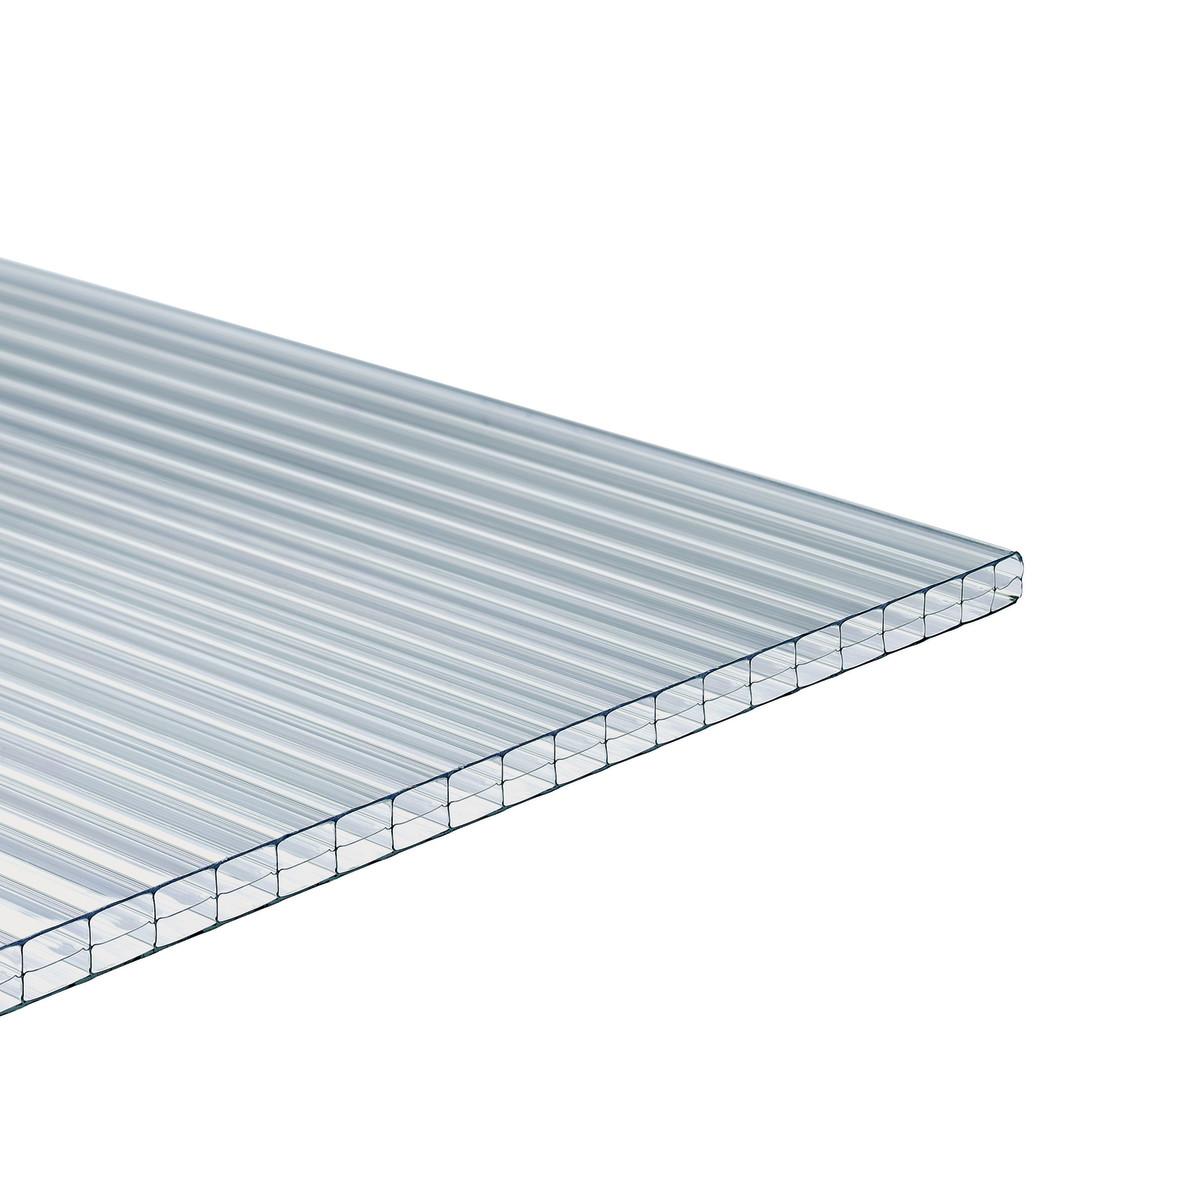 lastra policarbonato per tettoie verande serre leroy